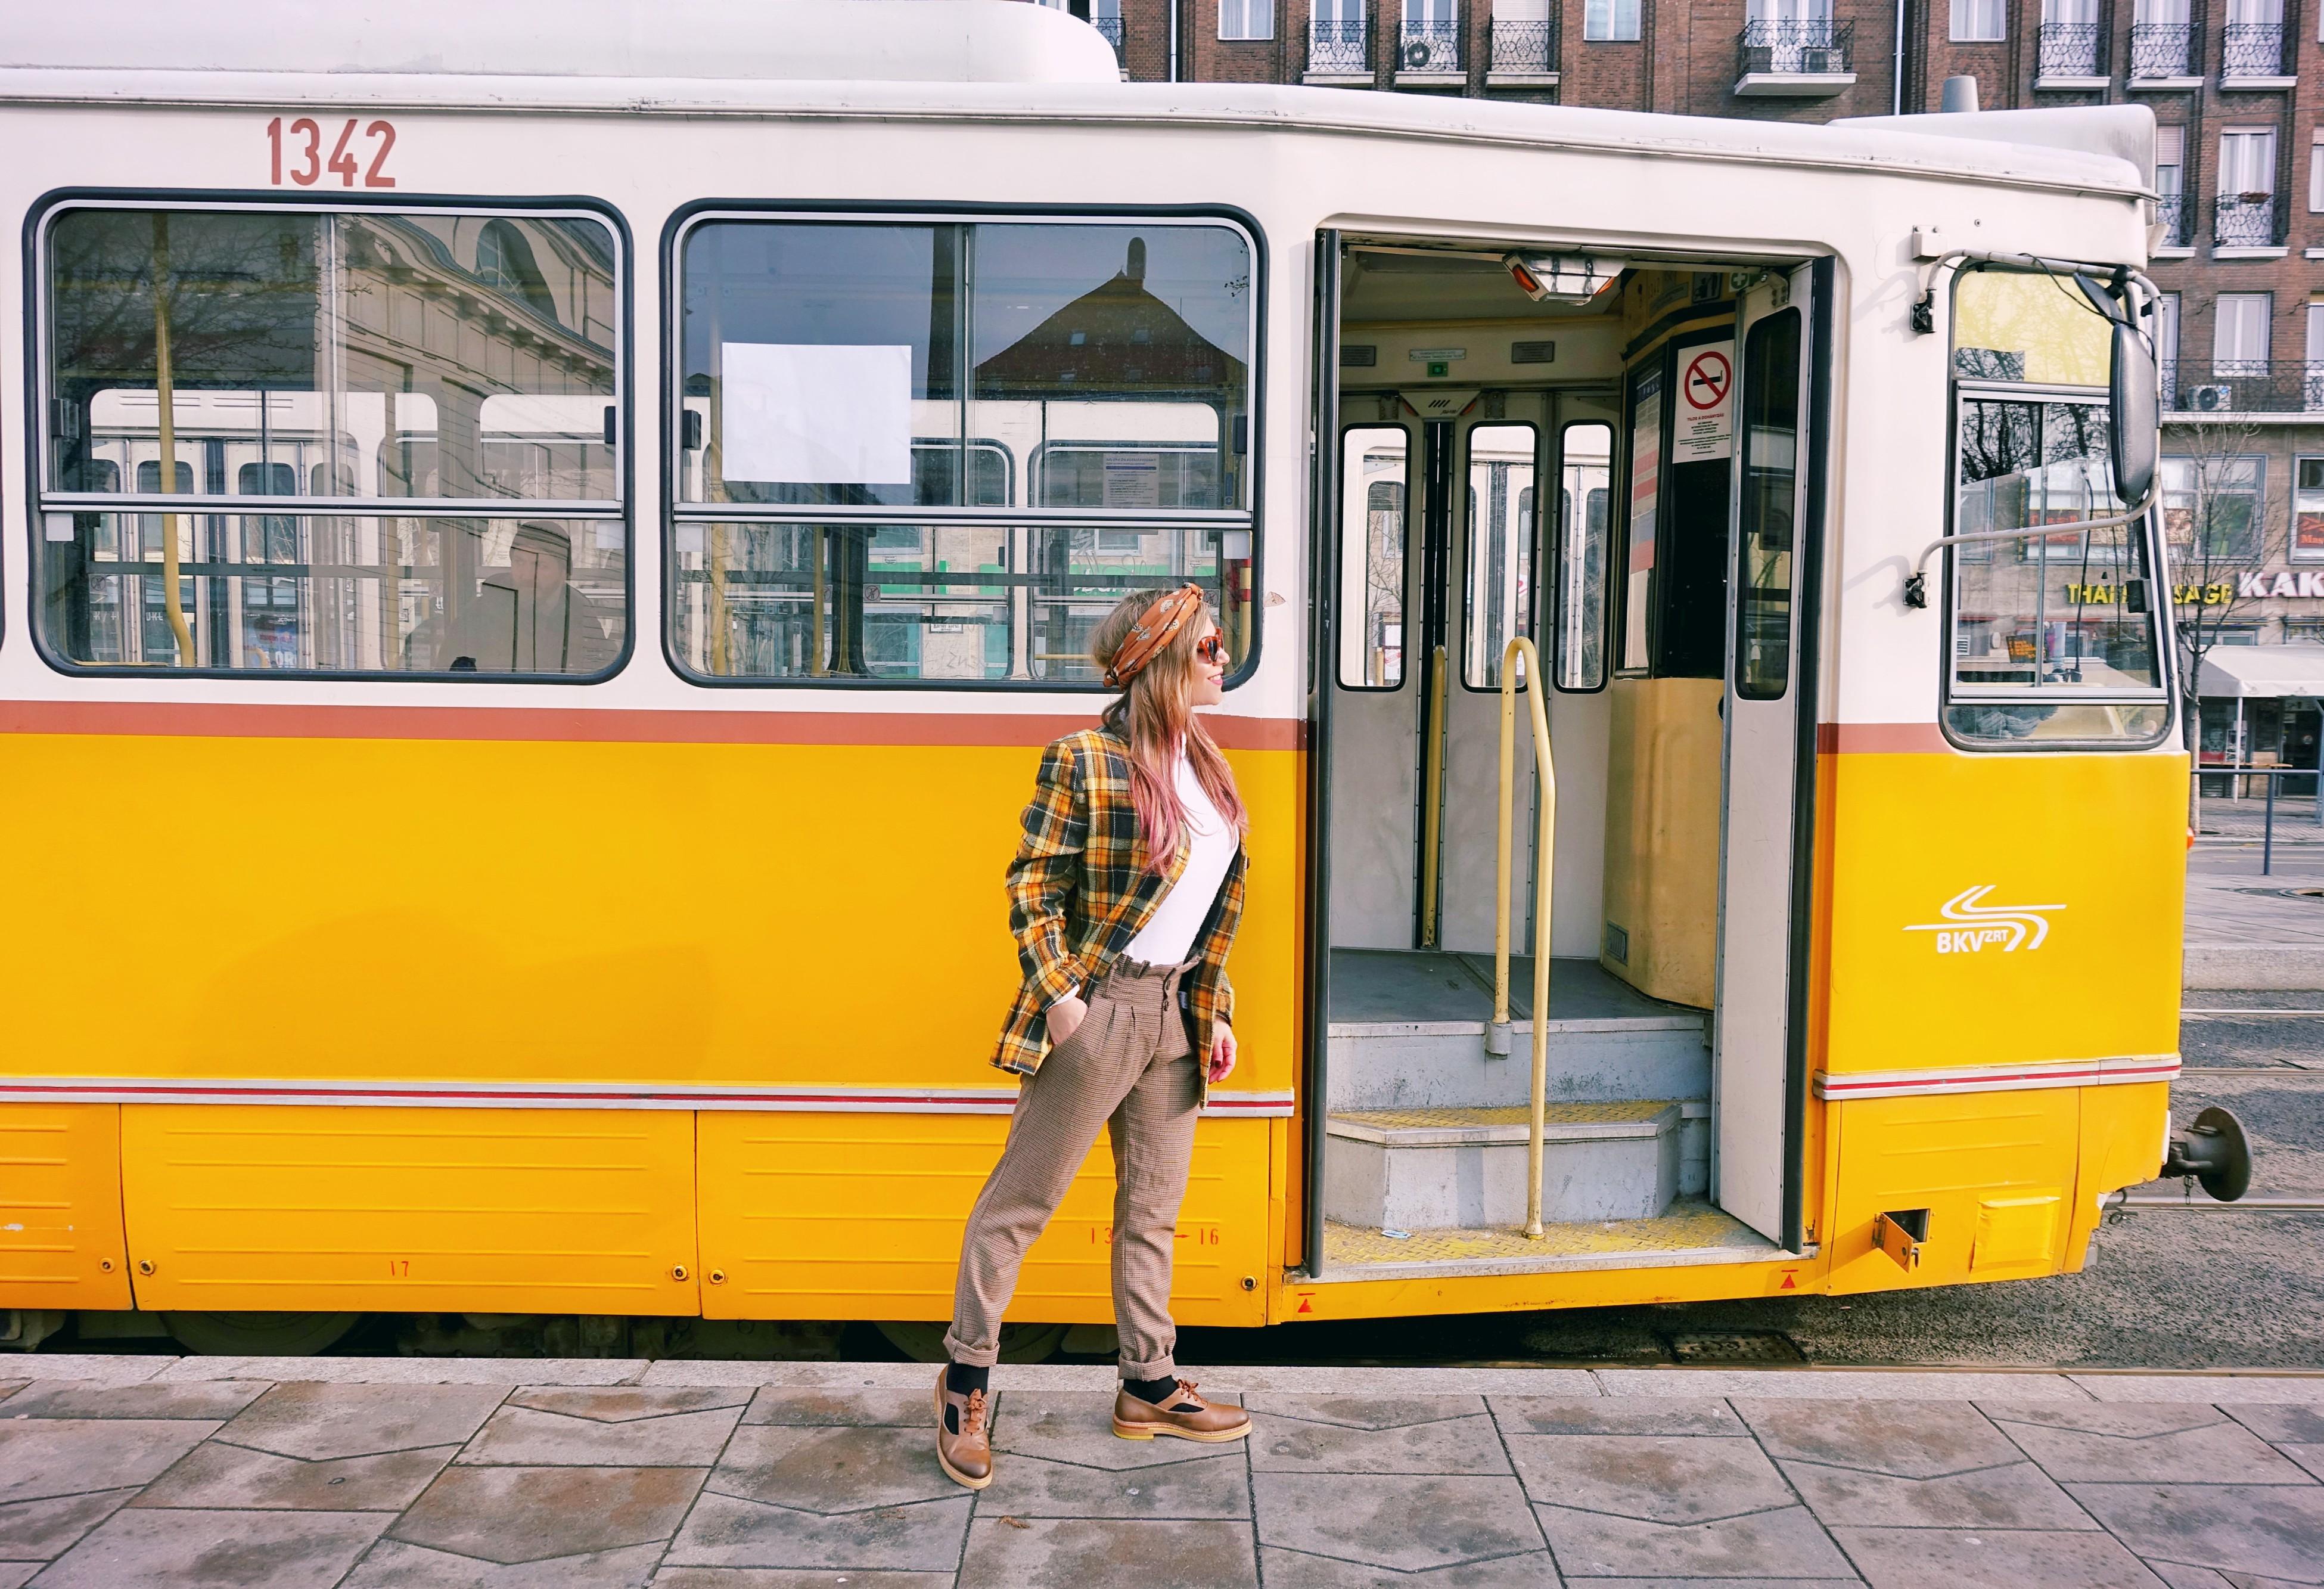 Blog-de-moda-ChicAdicta-fashion-travel-influencer-Chic-Adicta-Budapest-street-style-zapatos-neosens-blazer-de-cuadros-PiensaenChic-Piensa-en-Chic